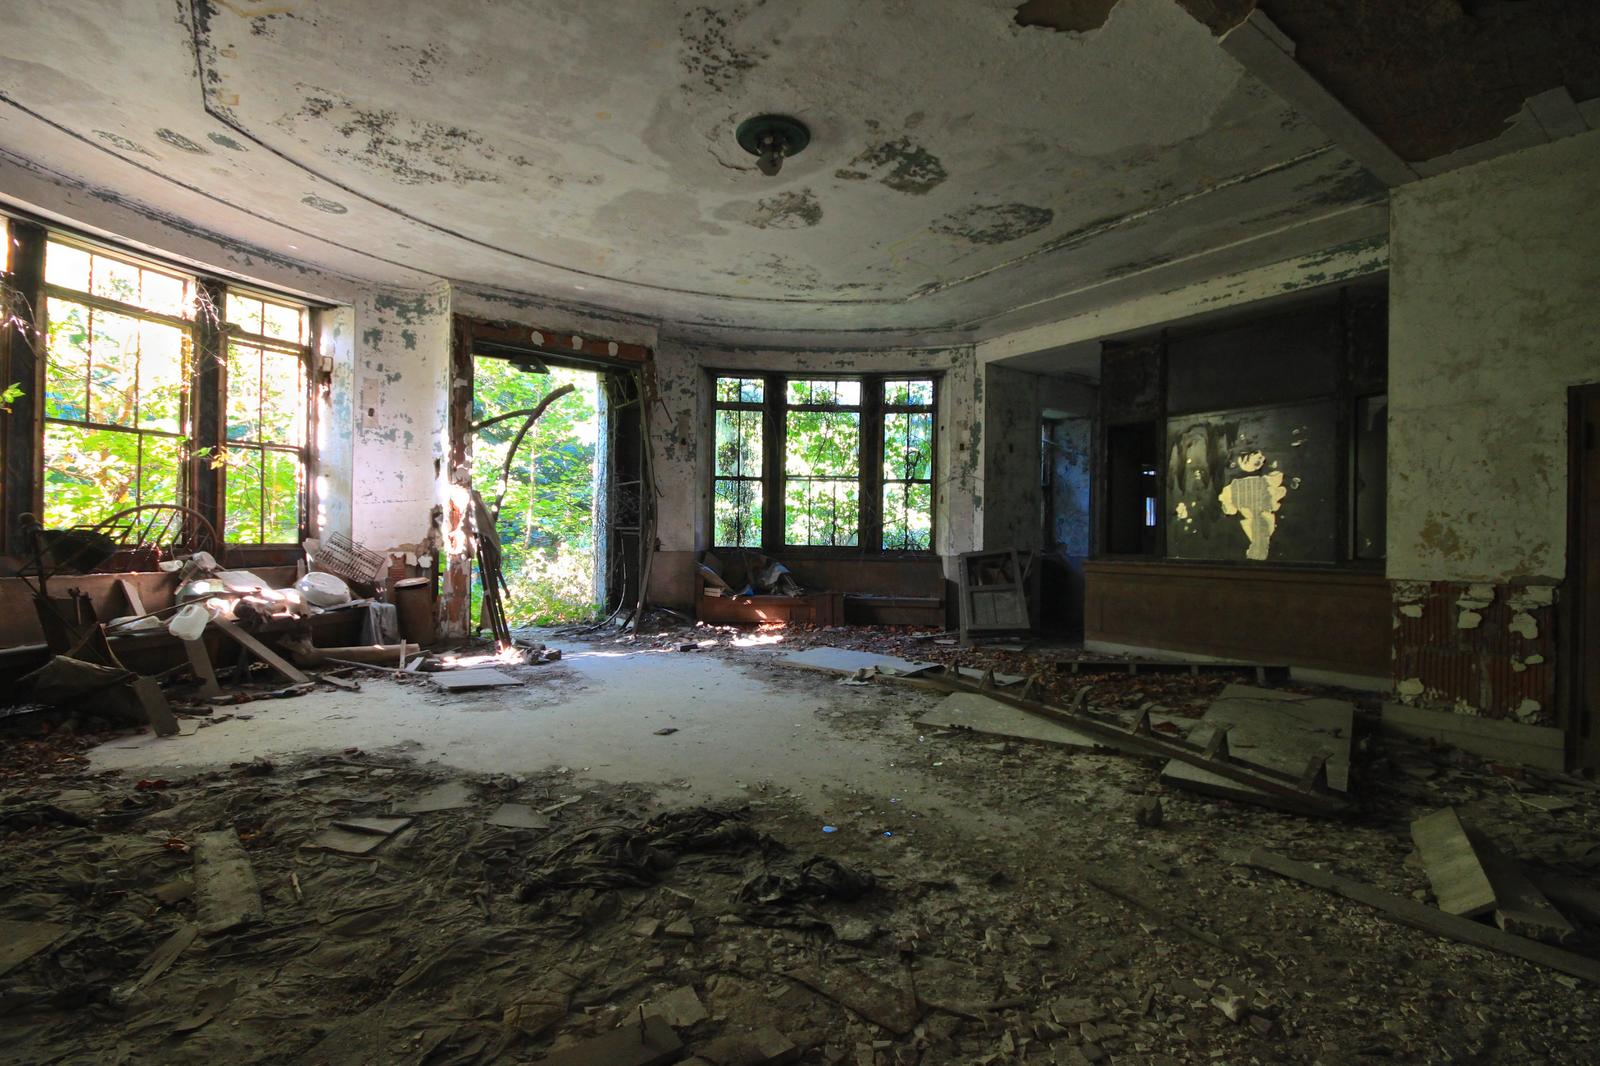 north-brother-island-credit-EsseXploreR-01-Riverside Island Isolation Hospital